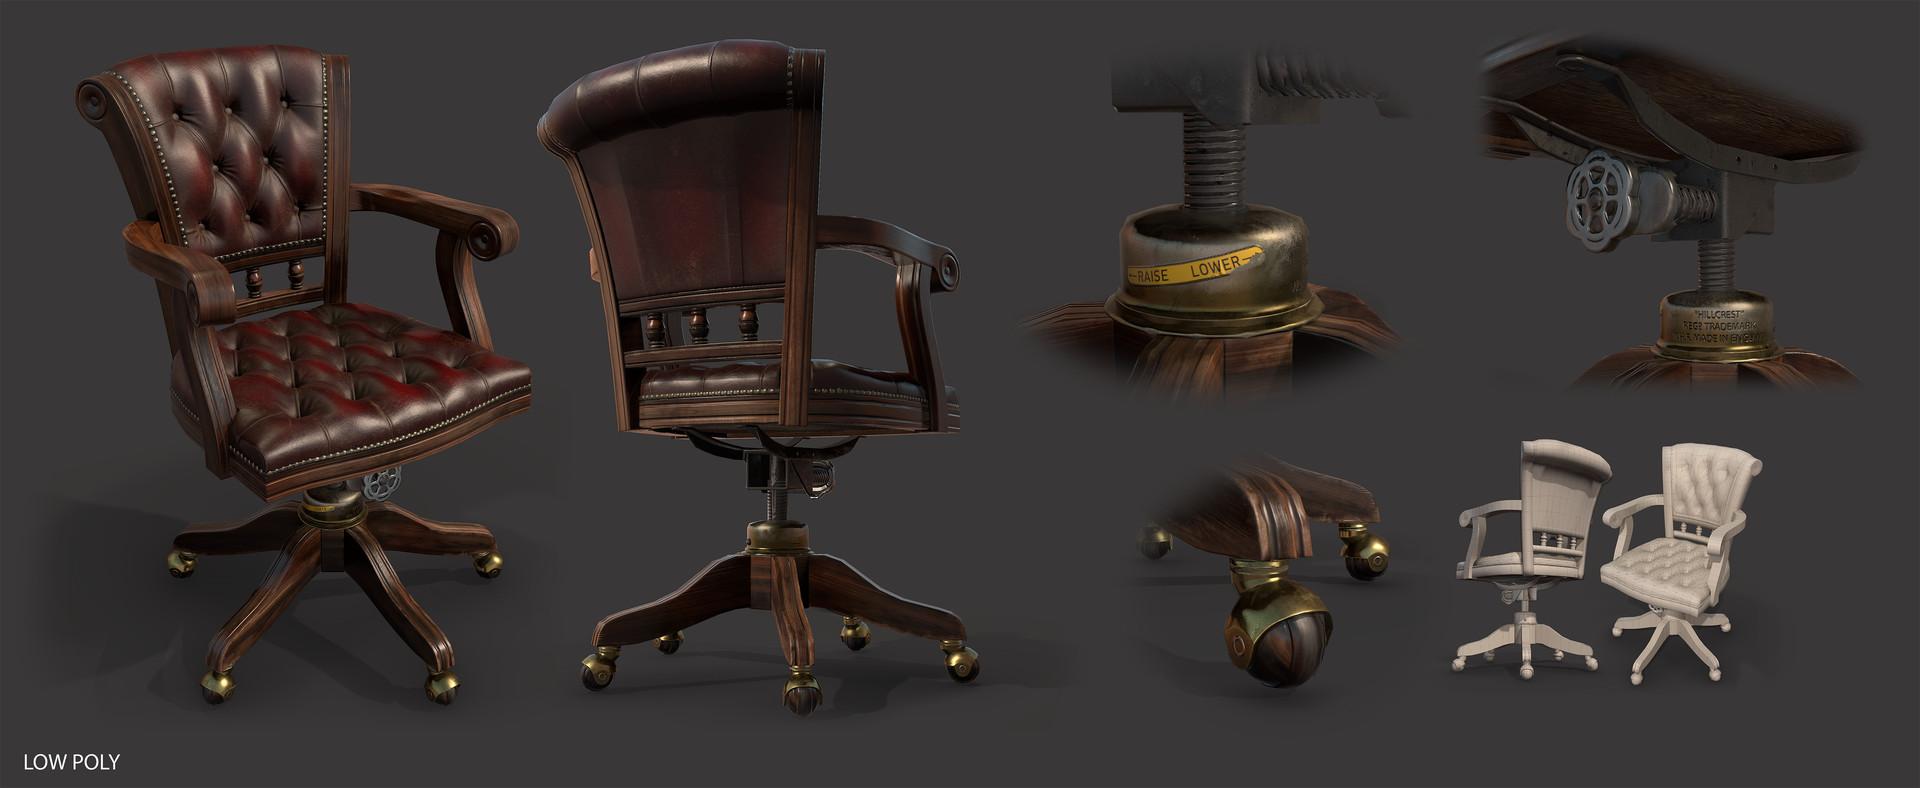 Paul foster chair sheet low